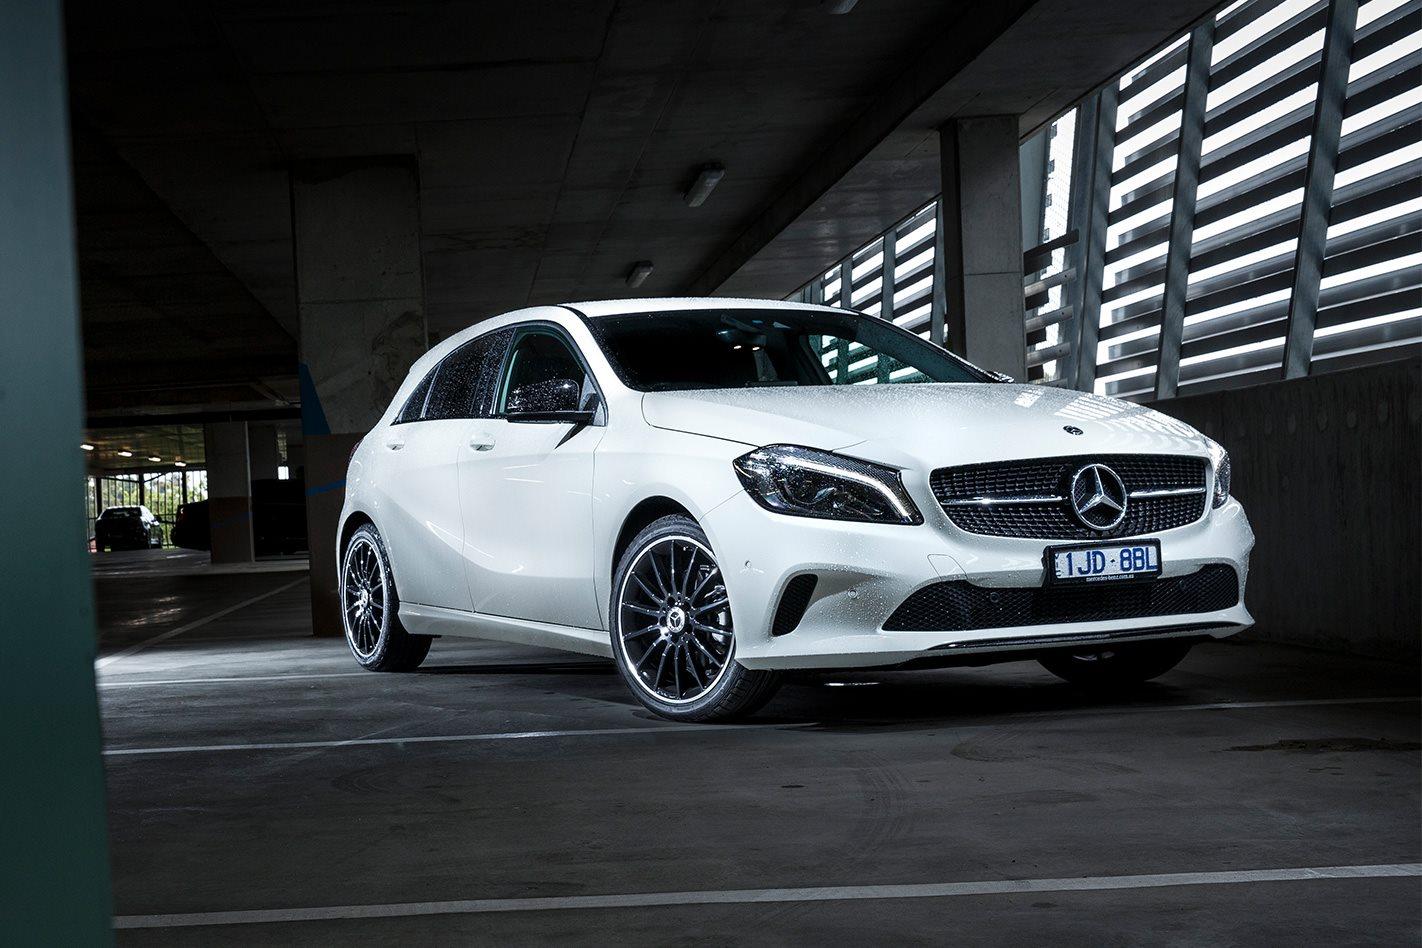 2018 Mercedes Benz A180 City Edition Review